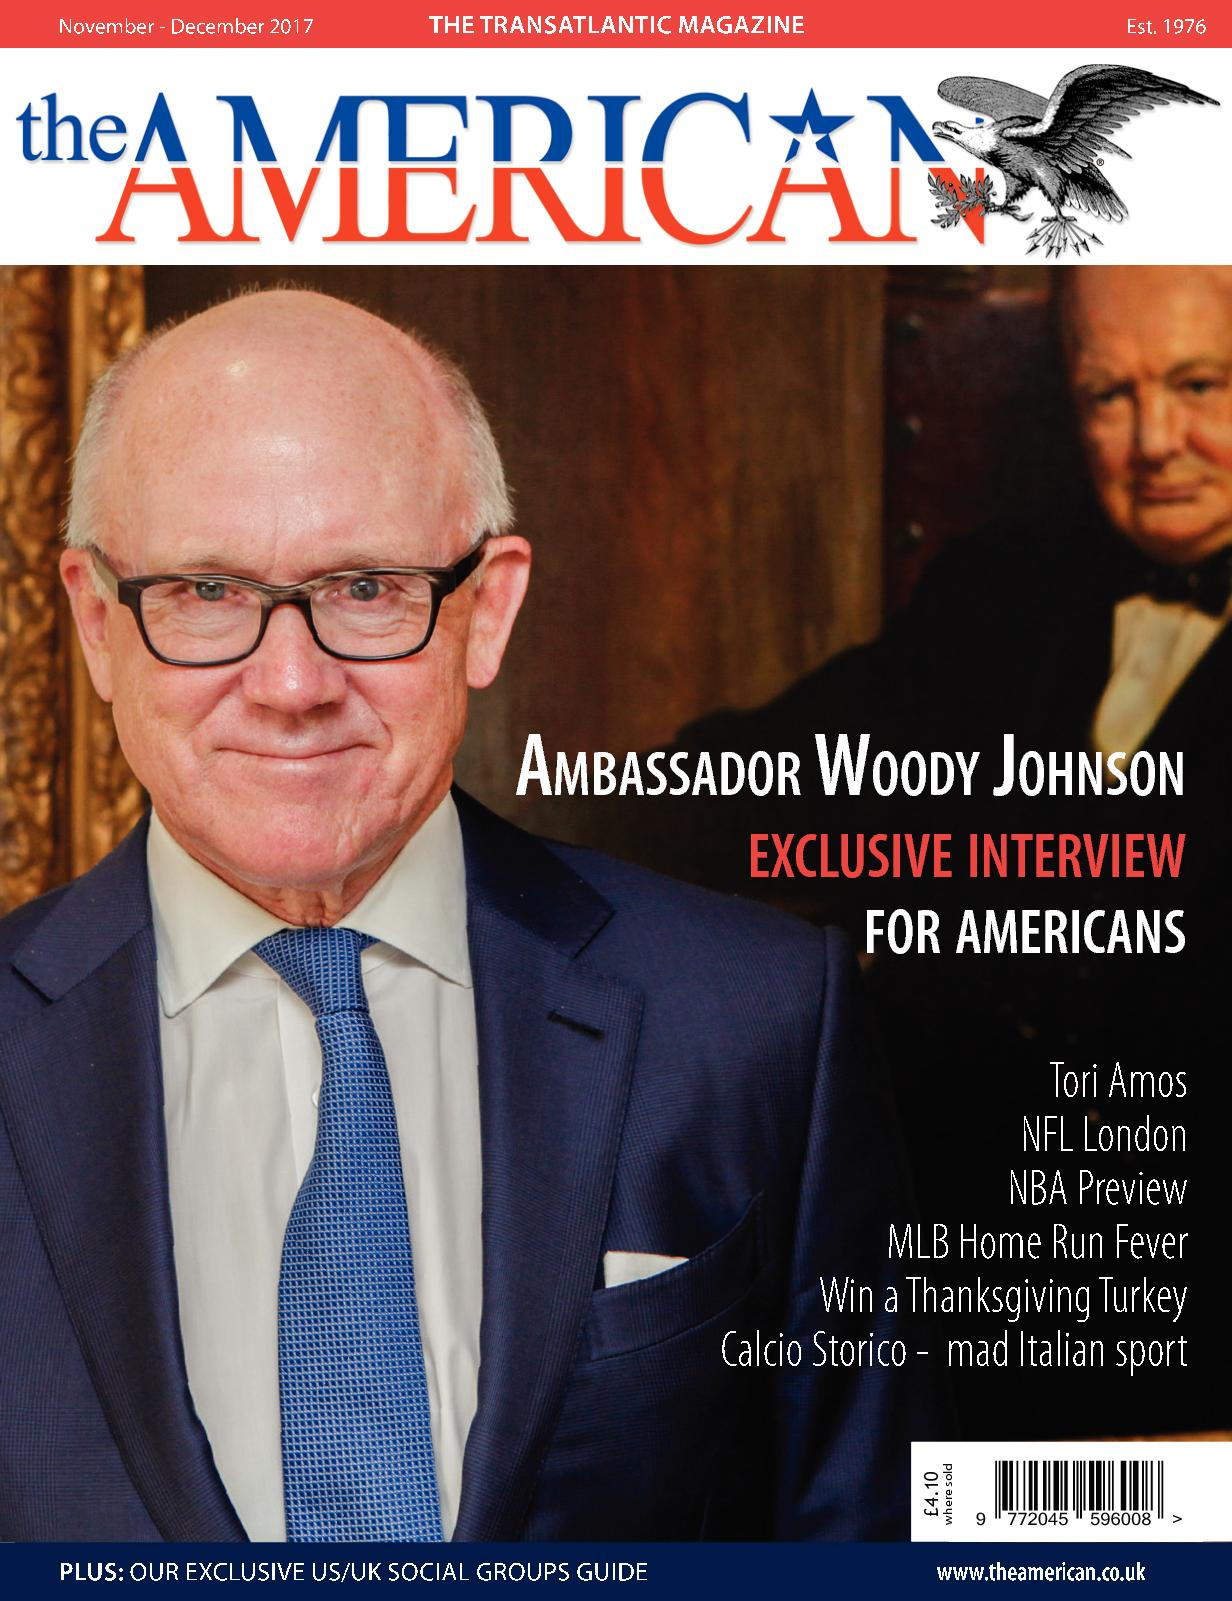 Calaméo - The American November-December 2017 Issue 760 3cbd7ce21